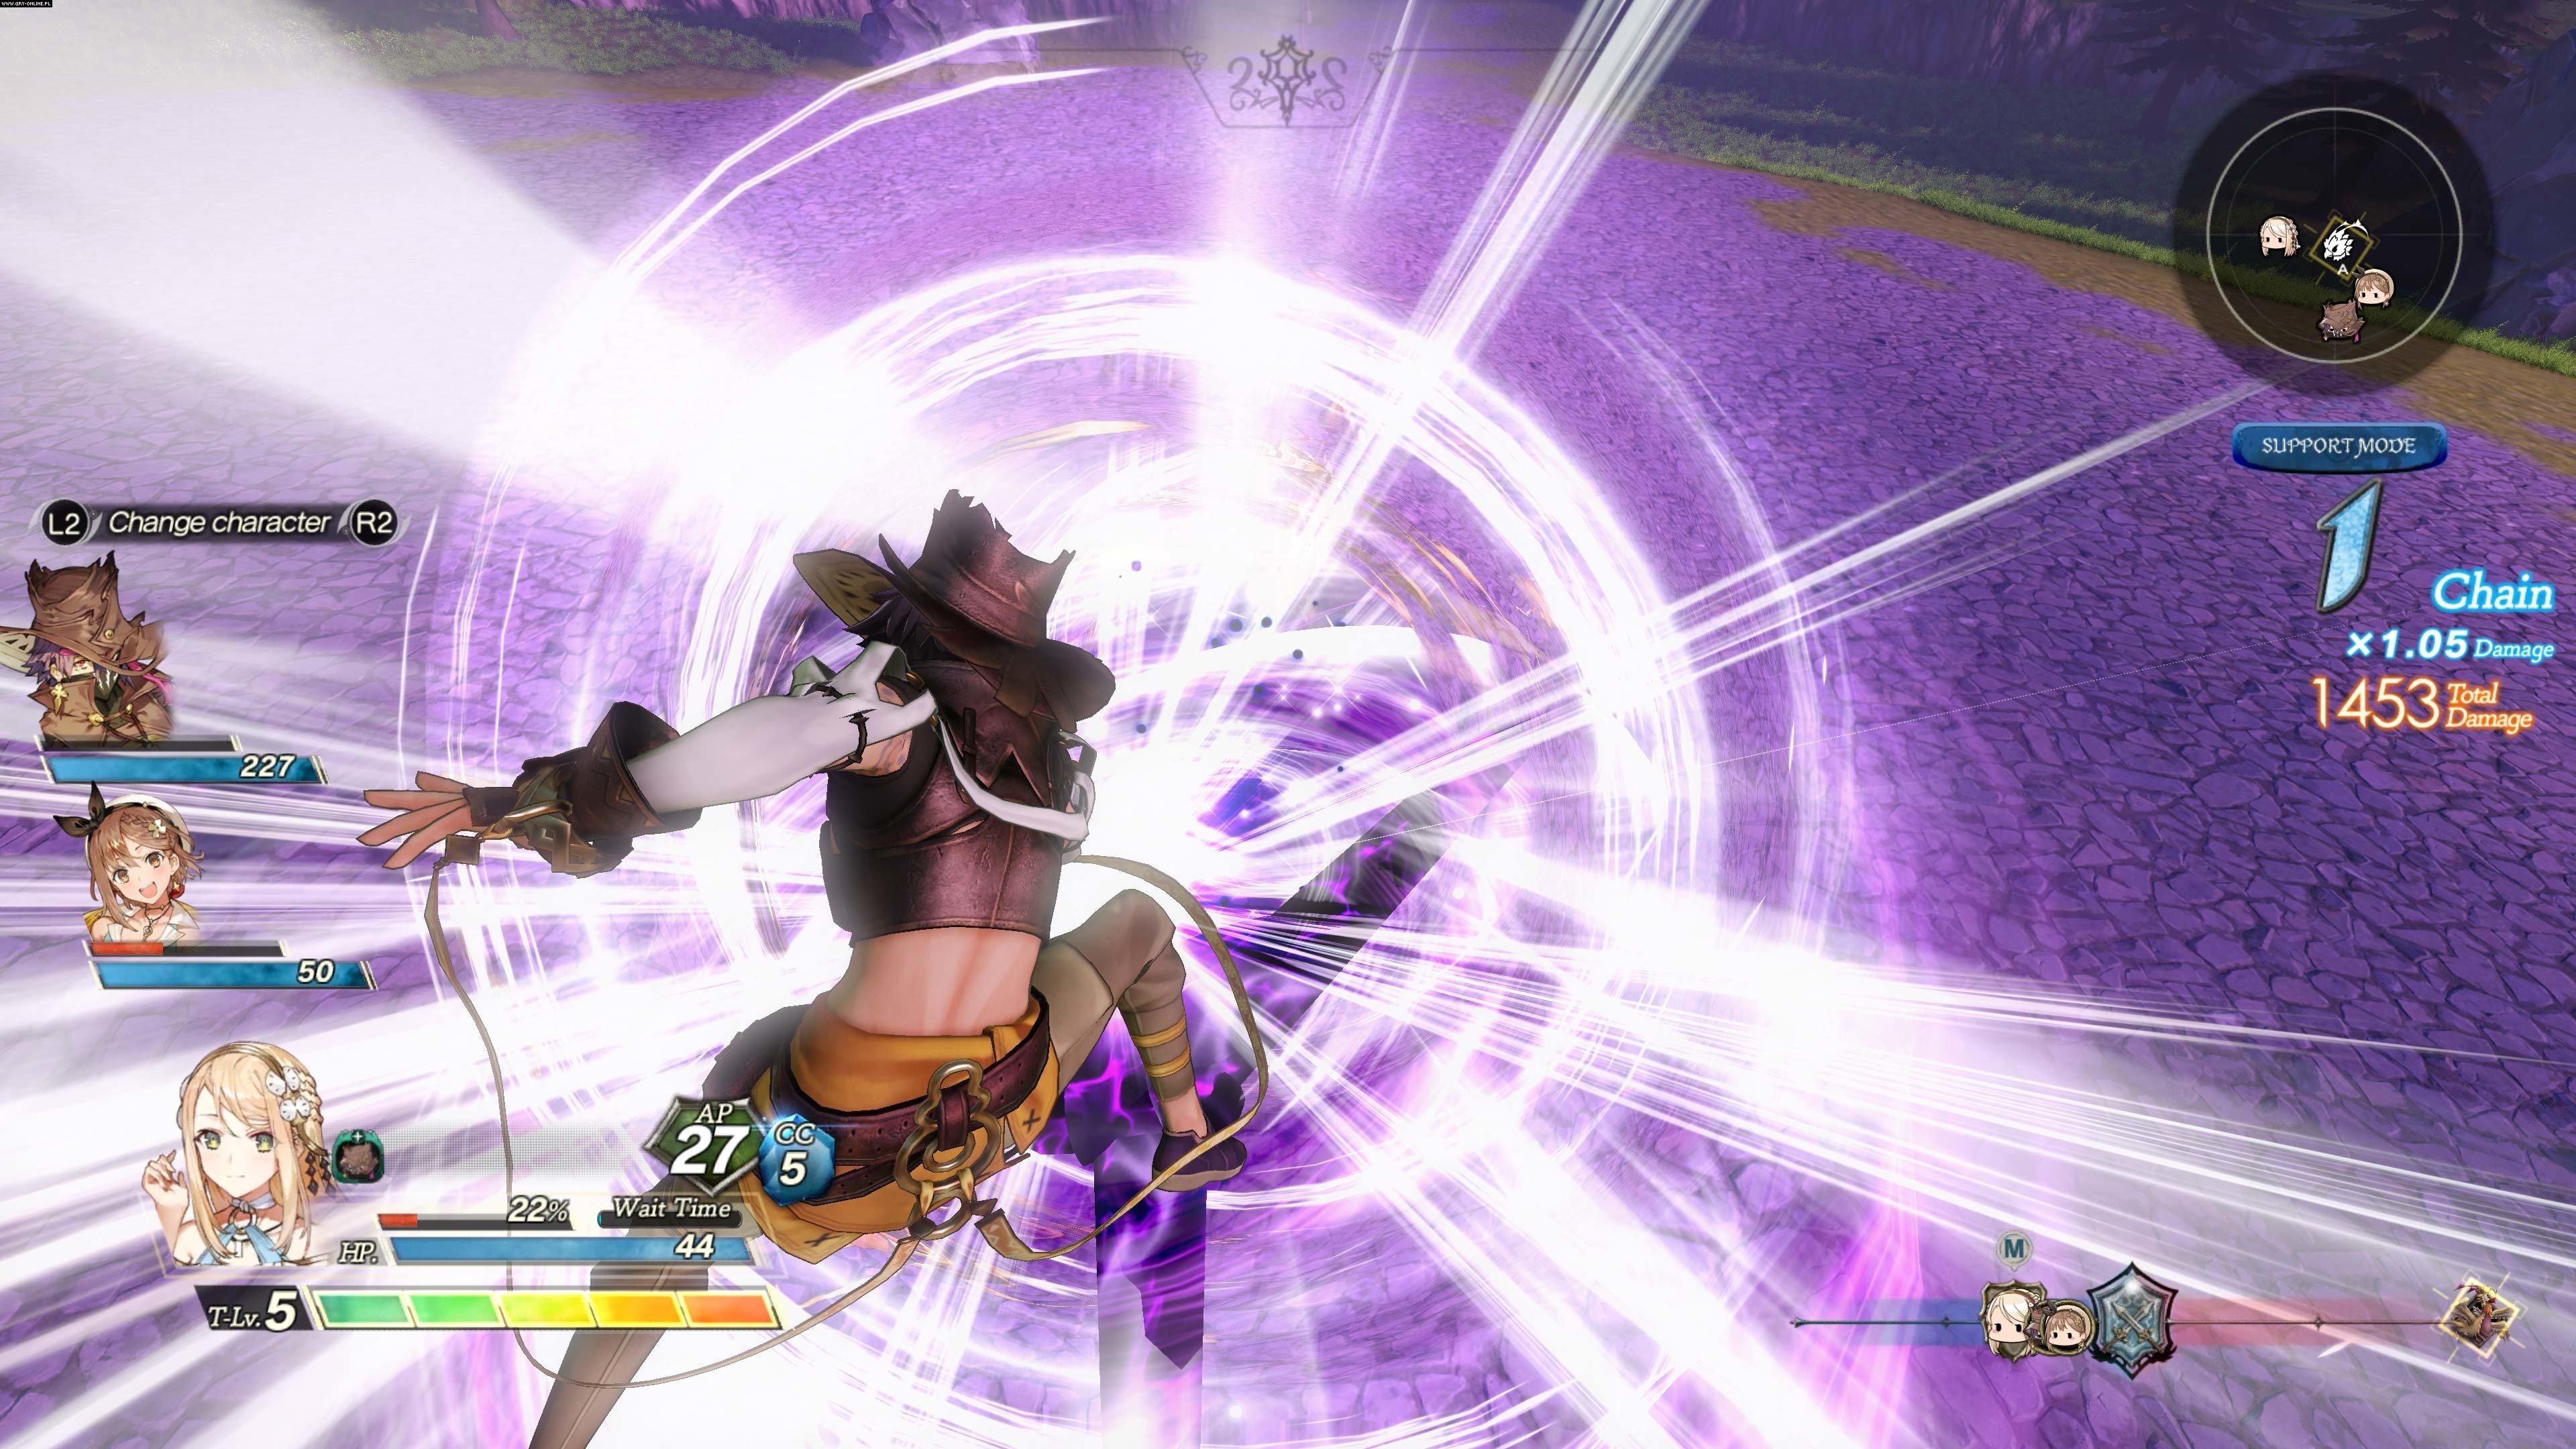 Atelier Ryza 2: Lost Legends & the Secret Fairy PC gameplay.